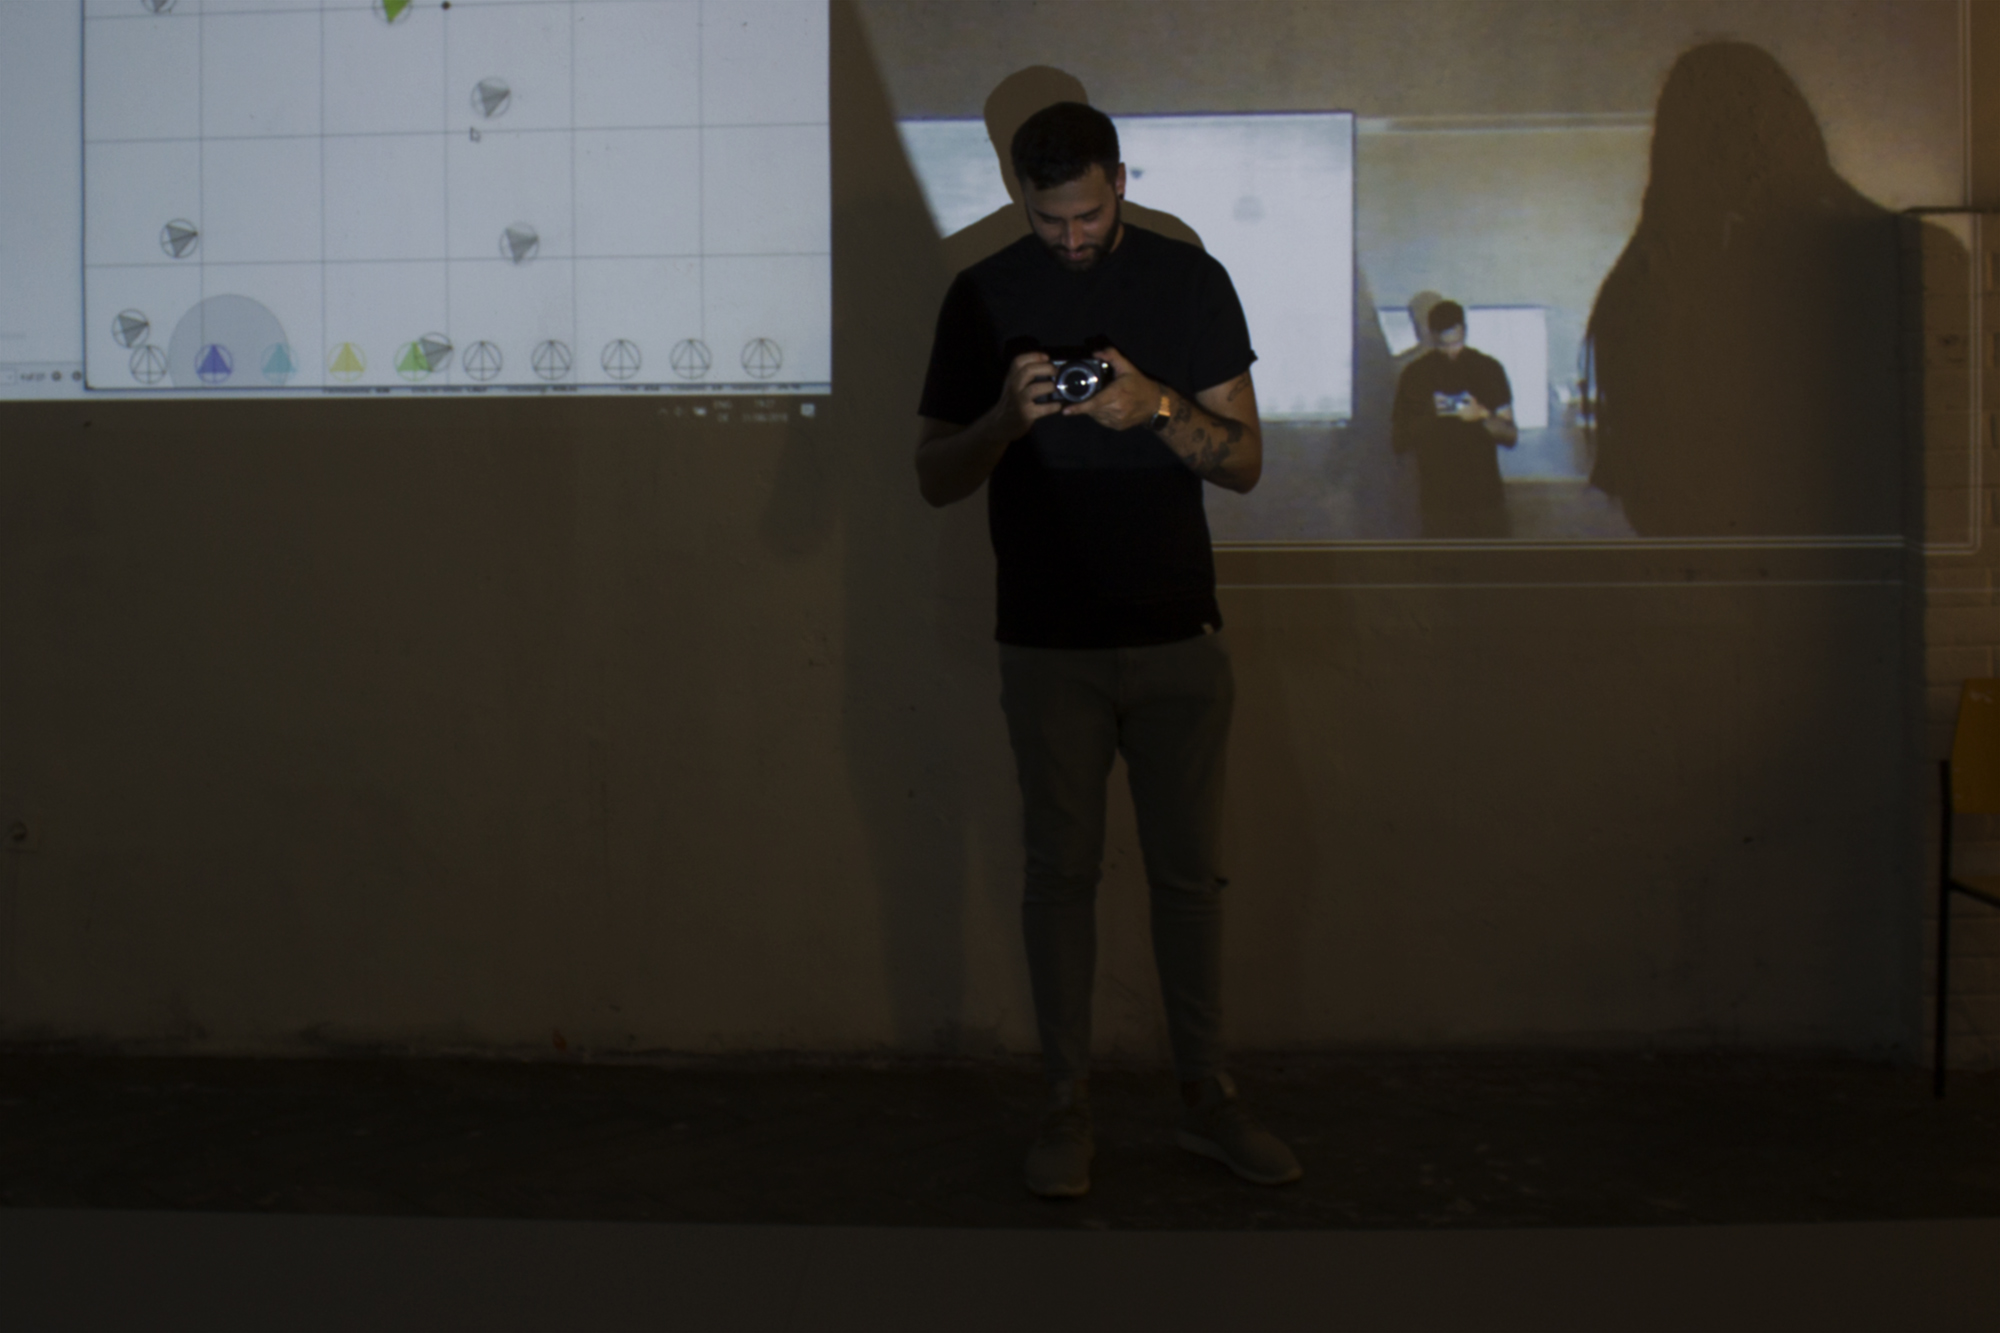 open_studio_empathy_swarm_robots_sm_0017_07